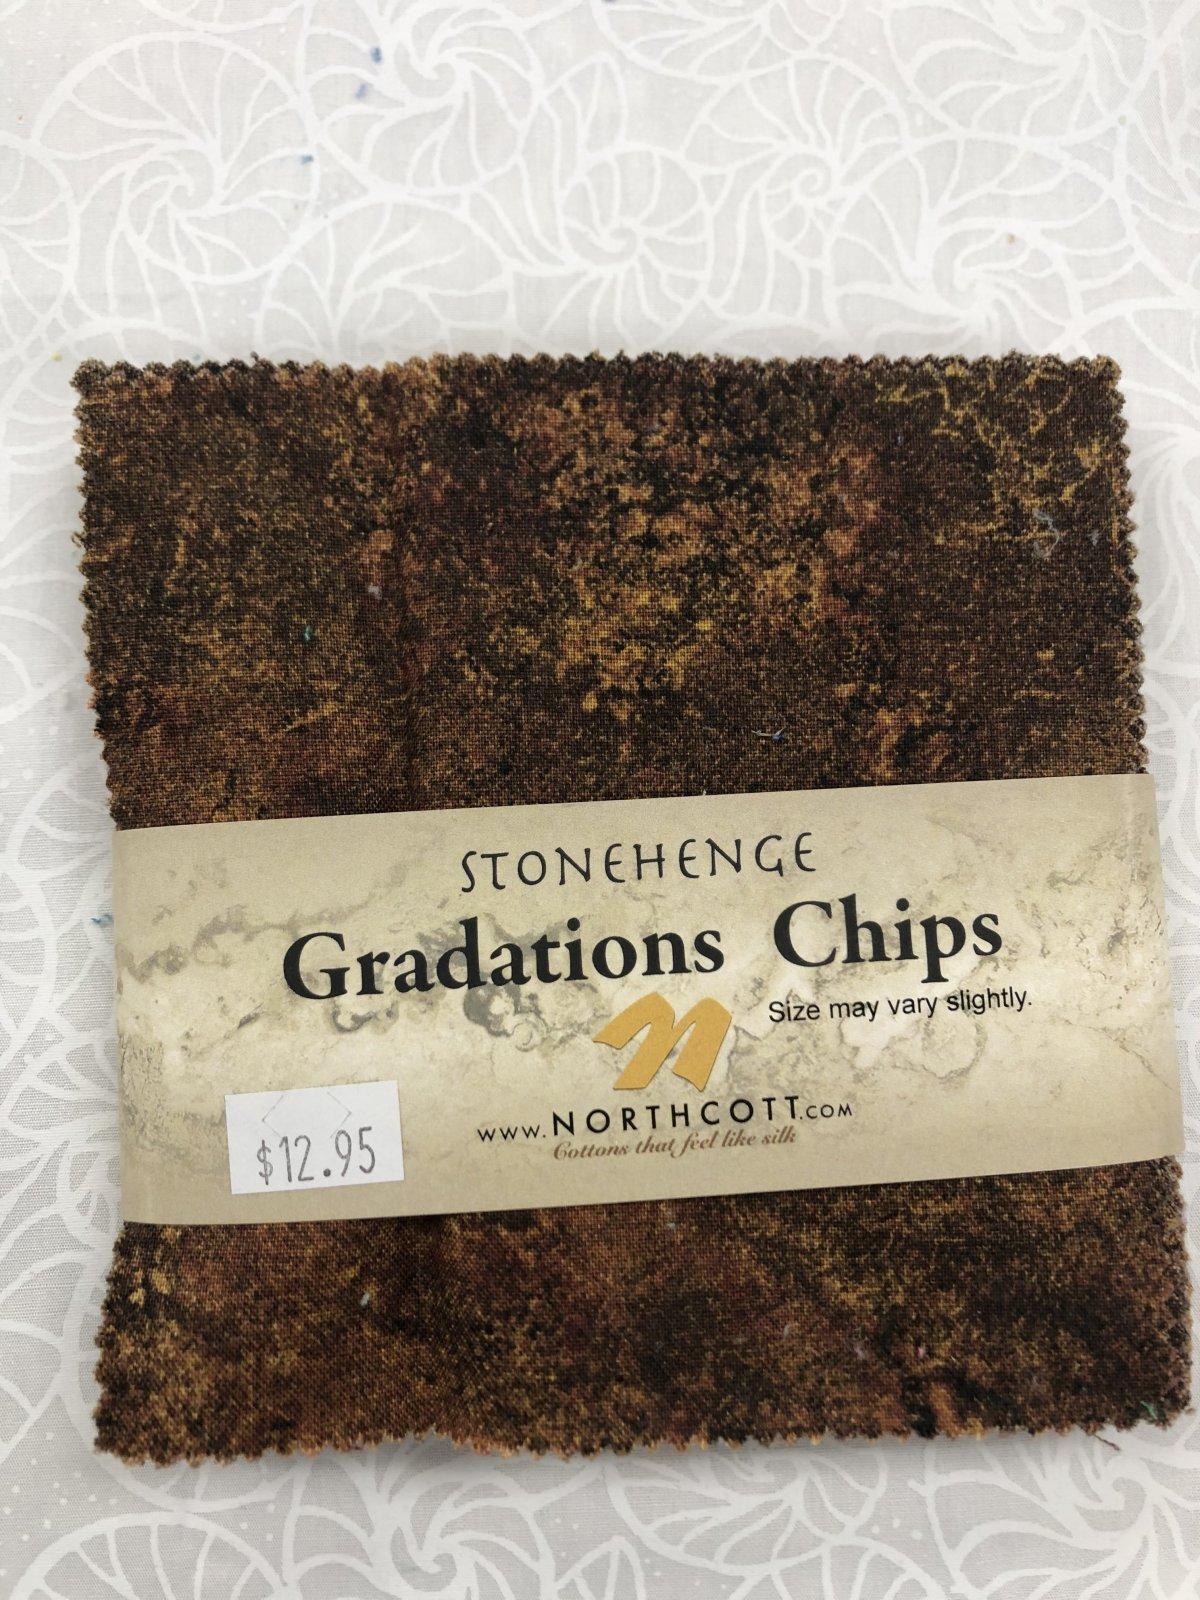 Stonehenge Iron Ore Graduation Chips 42 5in sq.